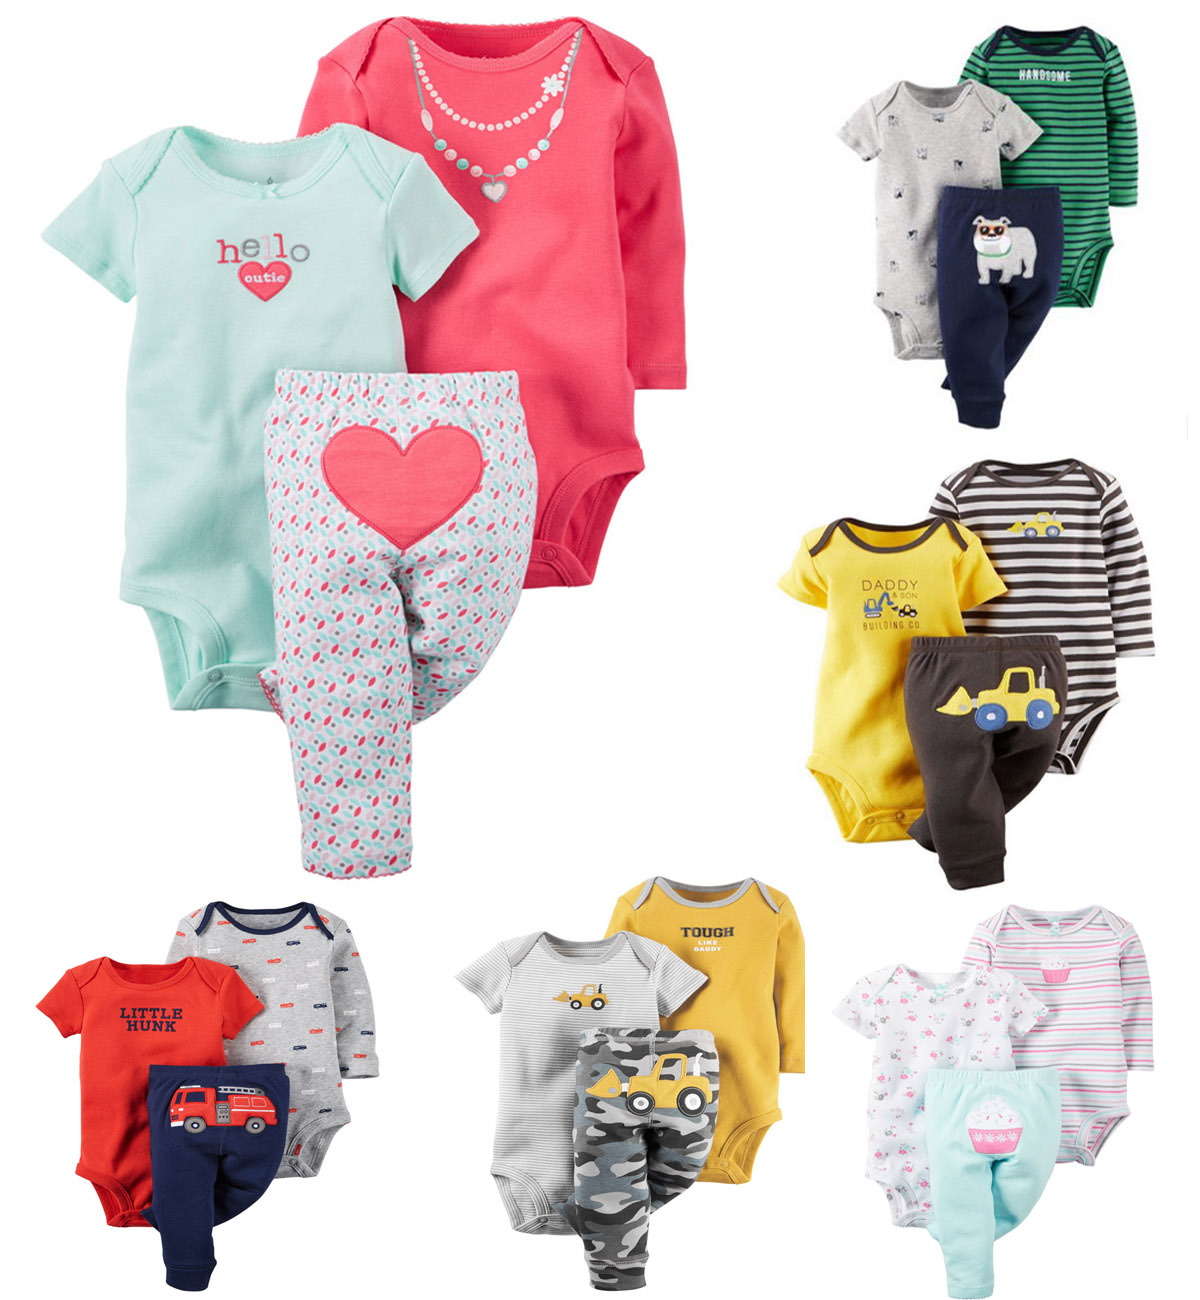 Original casaco infantil Baby Boys Girls Clothings Sets, kids bebe clothes Models (Bodysuits+Pants)Set - Super -Y Store No. 105537 store